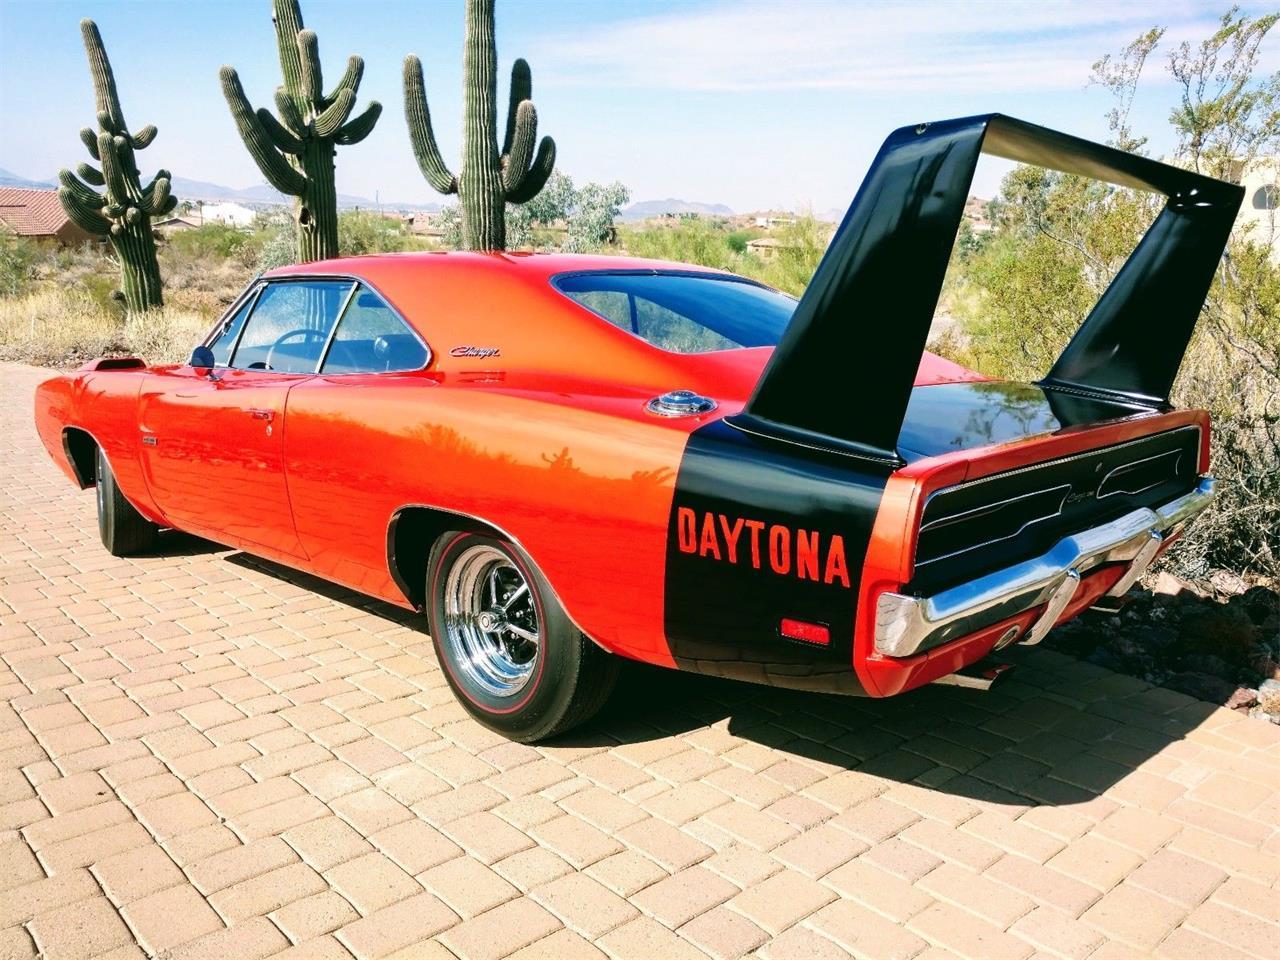 Charger Daytona For Sale >> 1969 Dodge Daytona For Sale Classiccars Com Cc 1083001